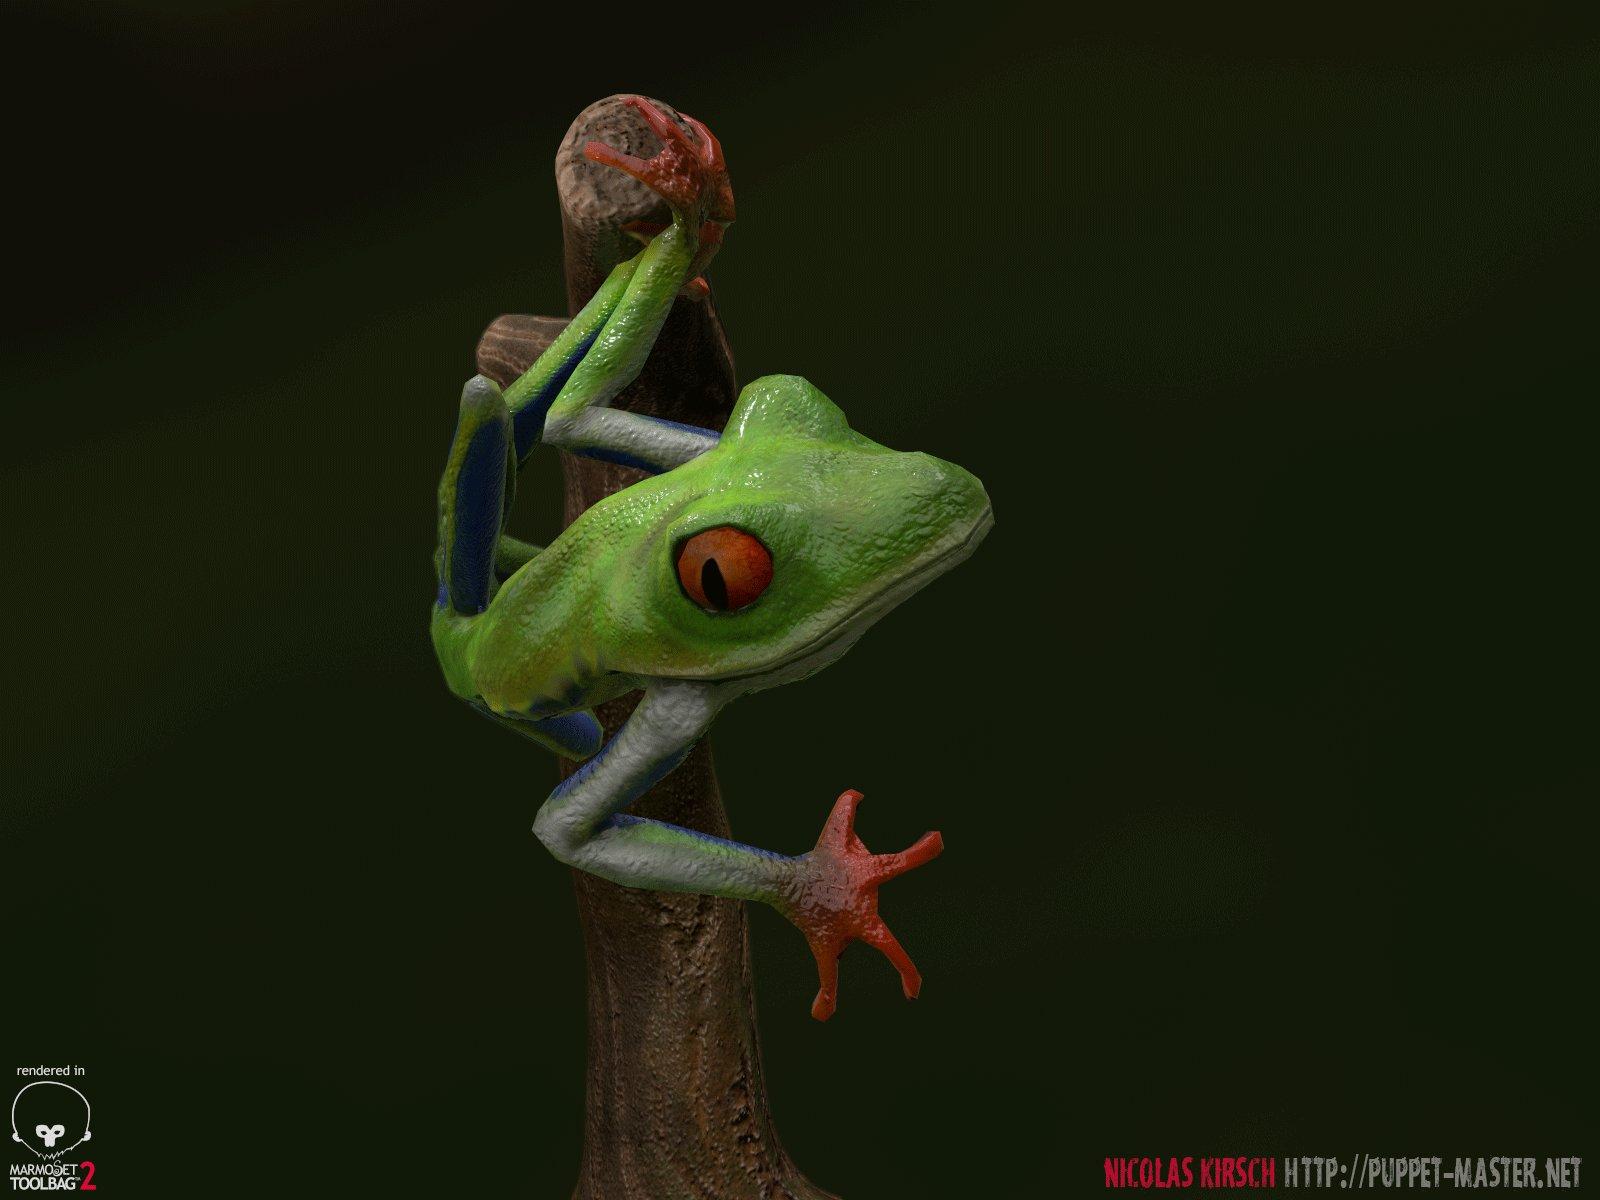 nicolas-kirsch-treefrog-superhero-05.jpg?1442191076